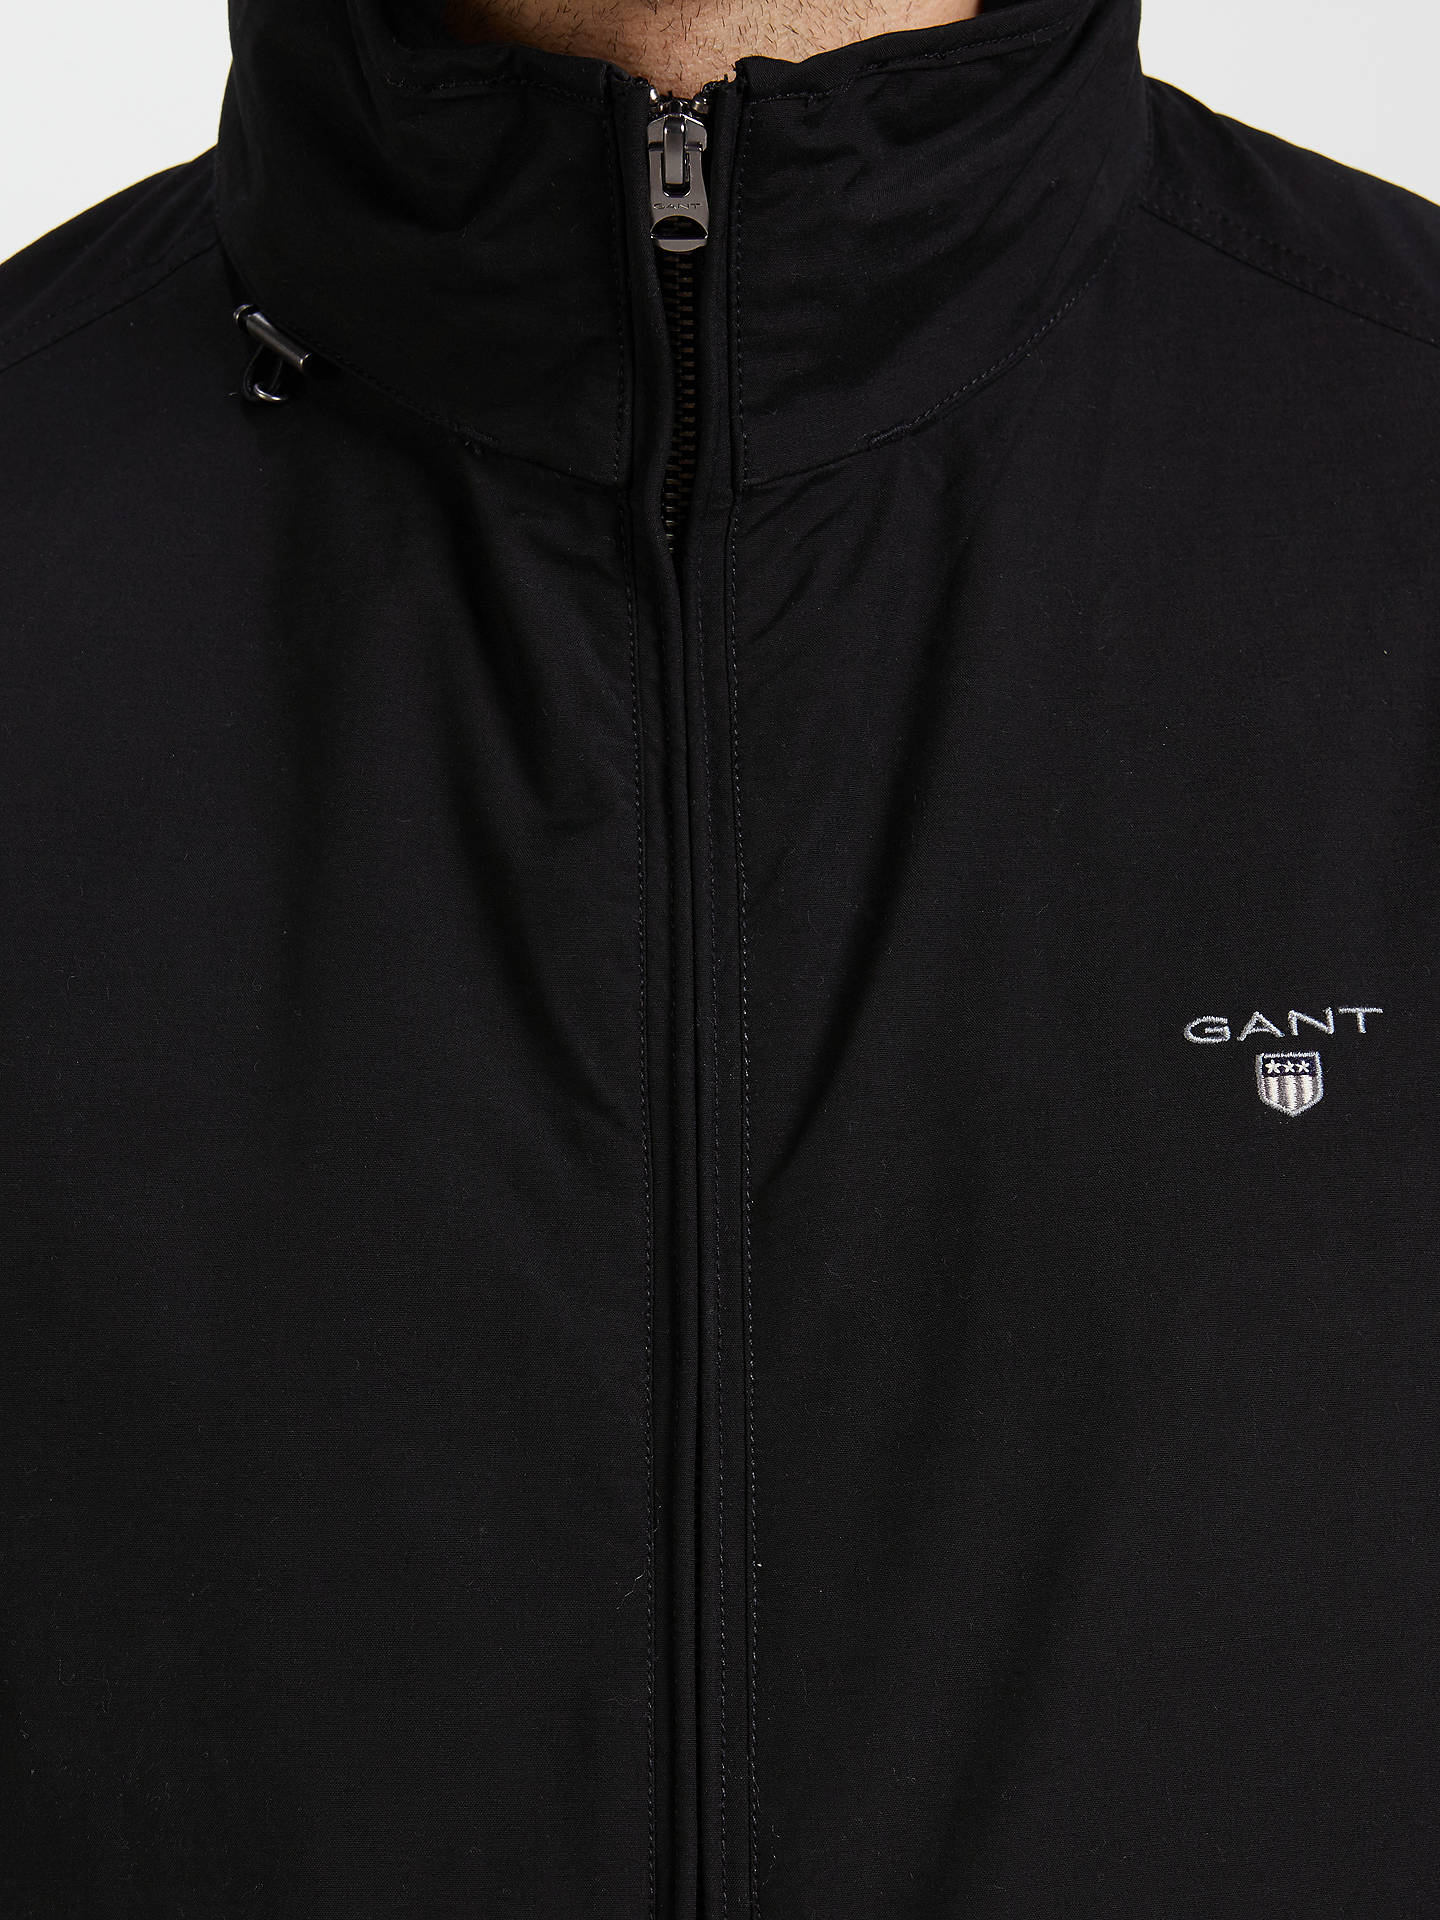 6fee358f0b ... Buy Gant Mid-Length Jacket, Black, S Online at johnlewis.com ...